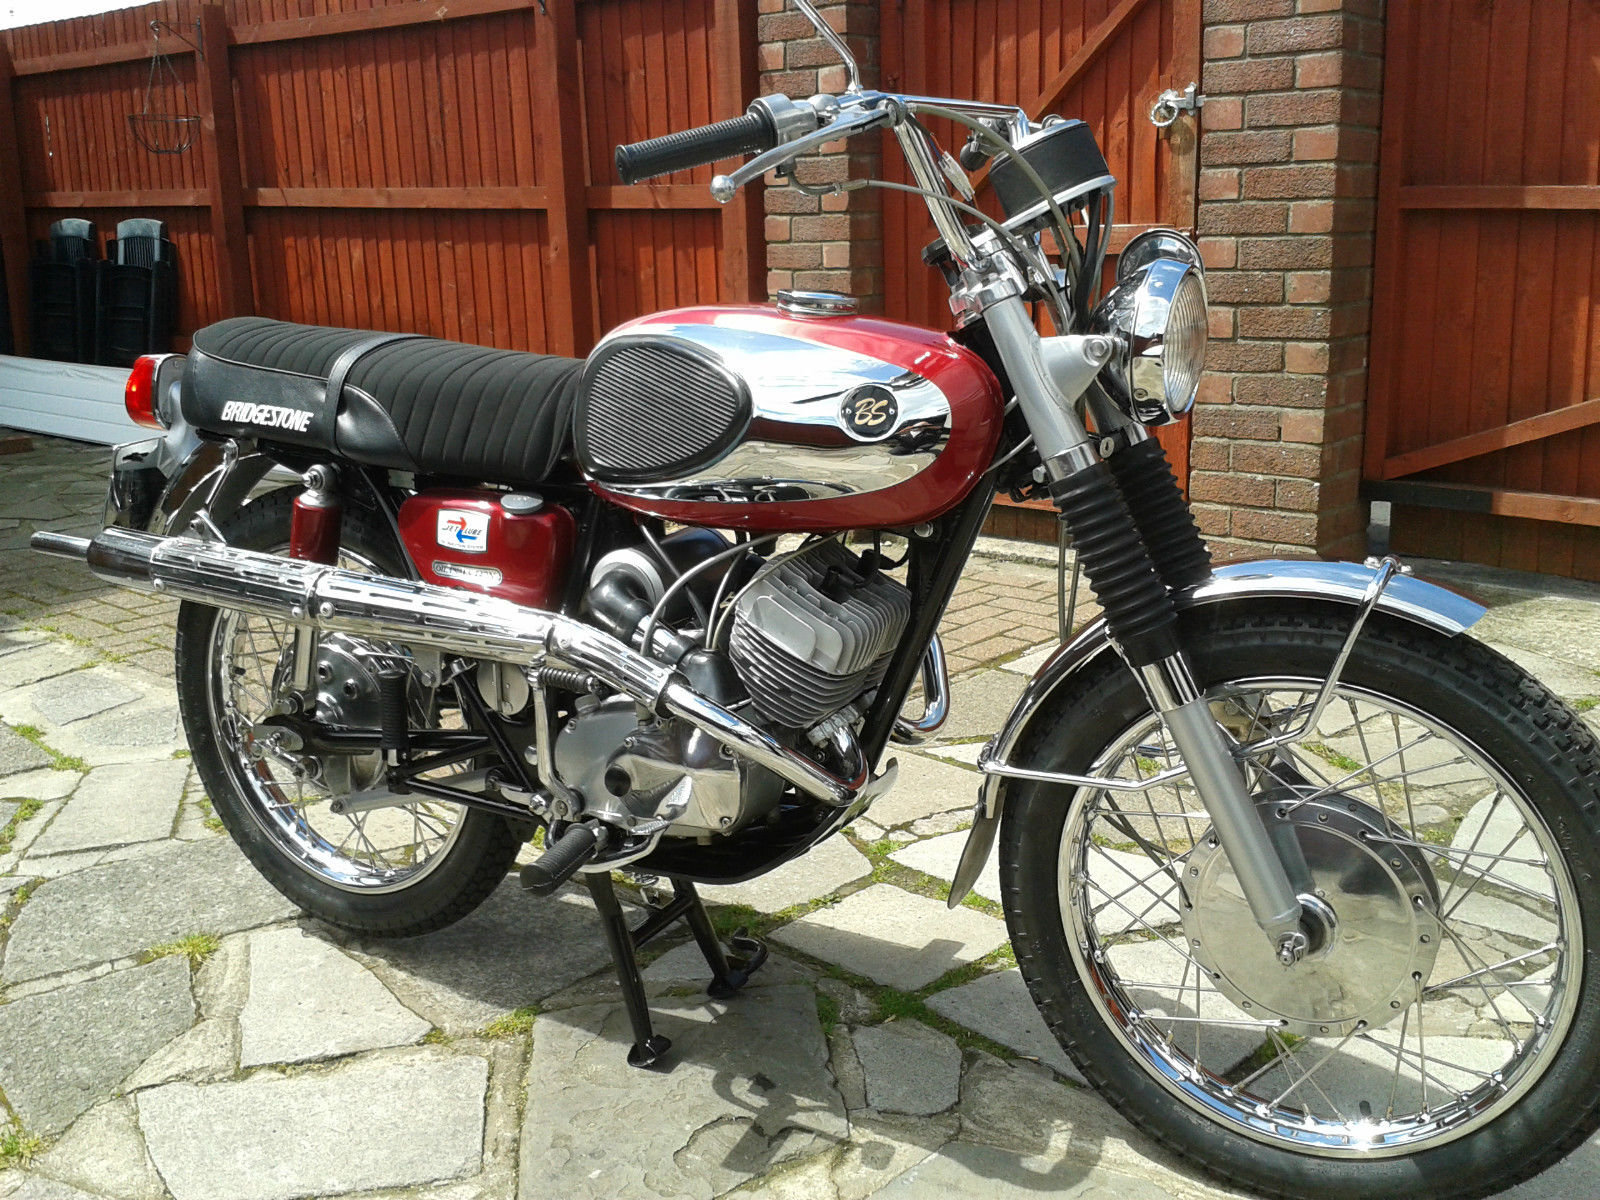 Bridgestone Mach11 -1969 - Motor and Transmission, Engine and Gearbox,